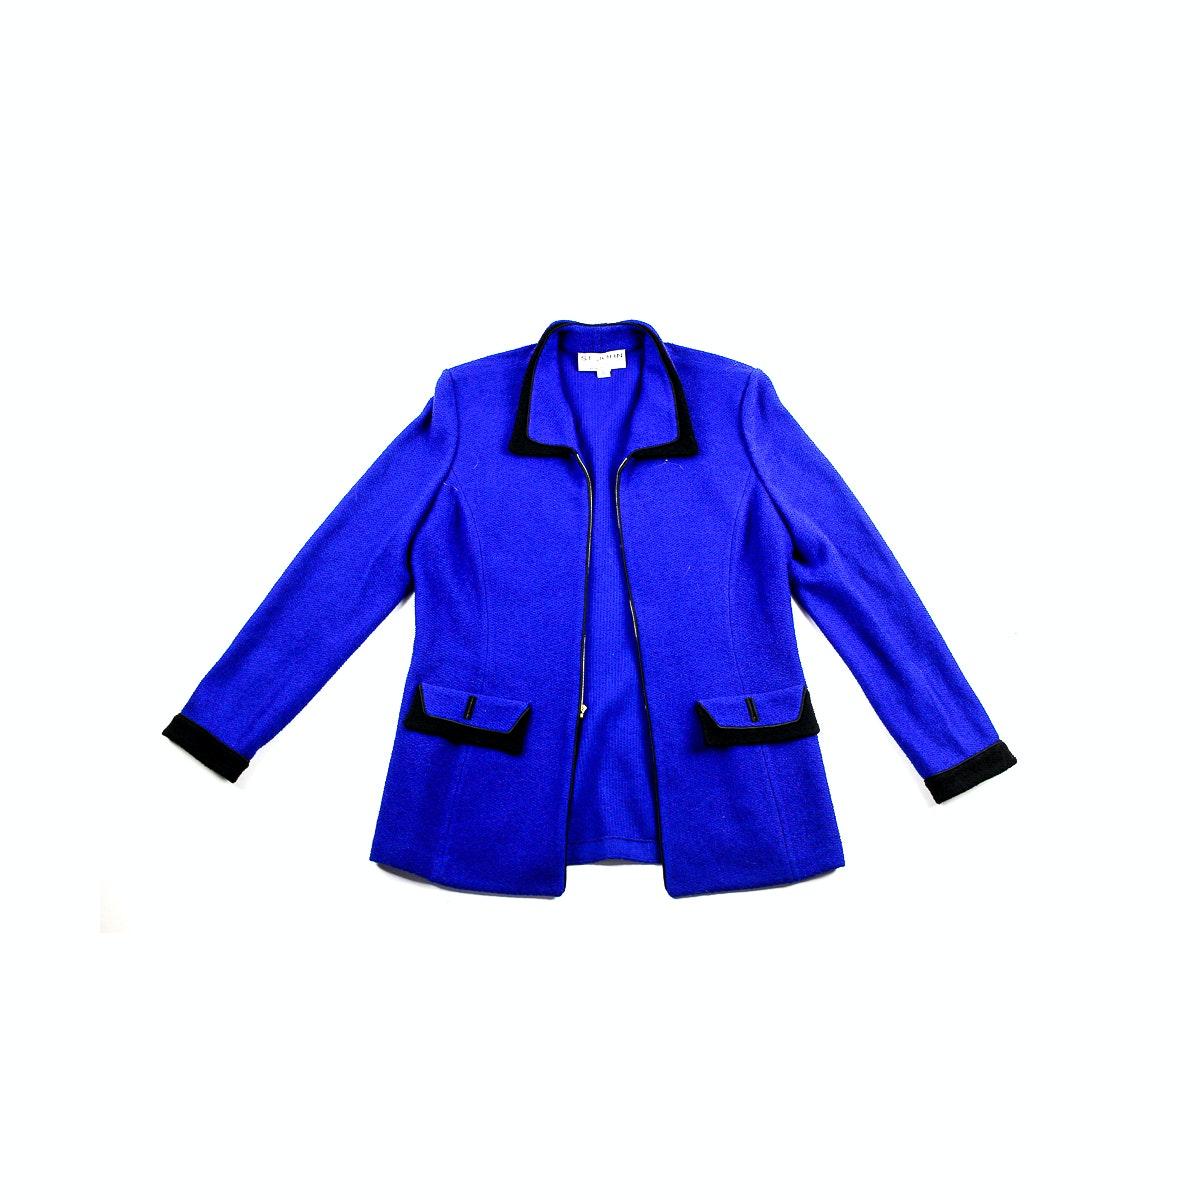 St. John Collection Blue Jacket